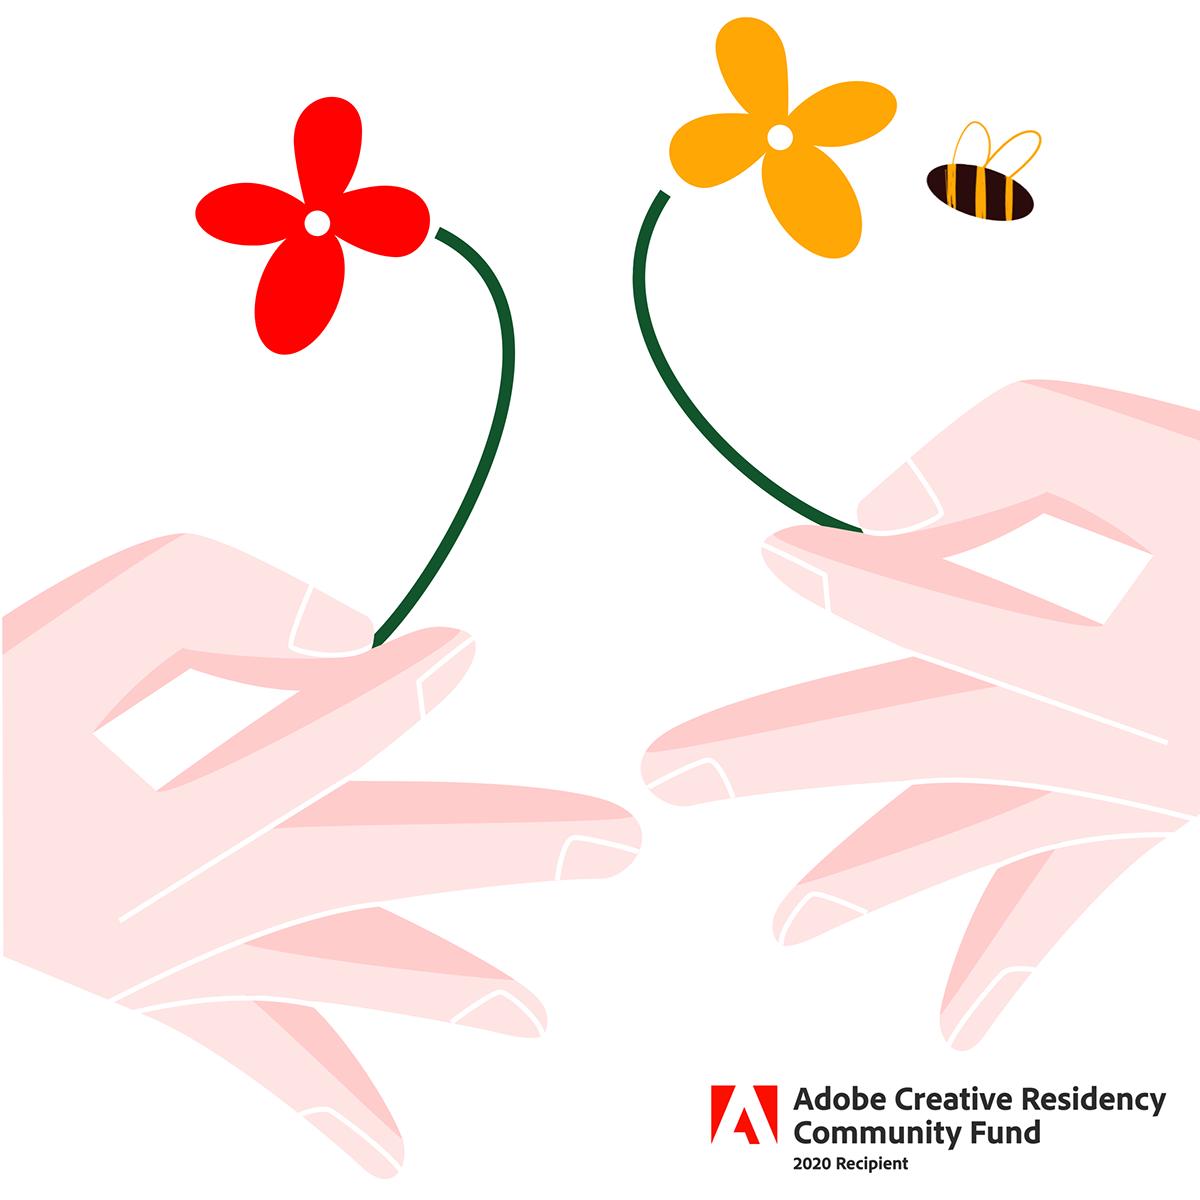 adobe design graphic illust ILLUSTRATION  sketch アドビ イラストレーション グラフィック デザイン